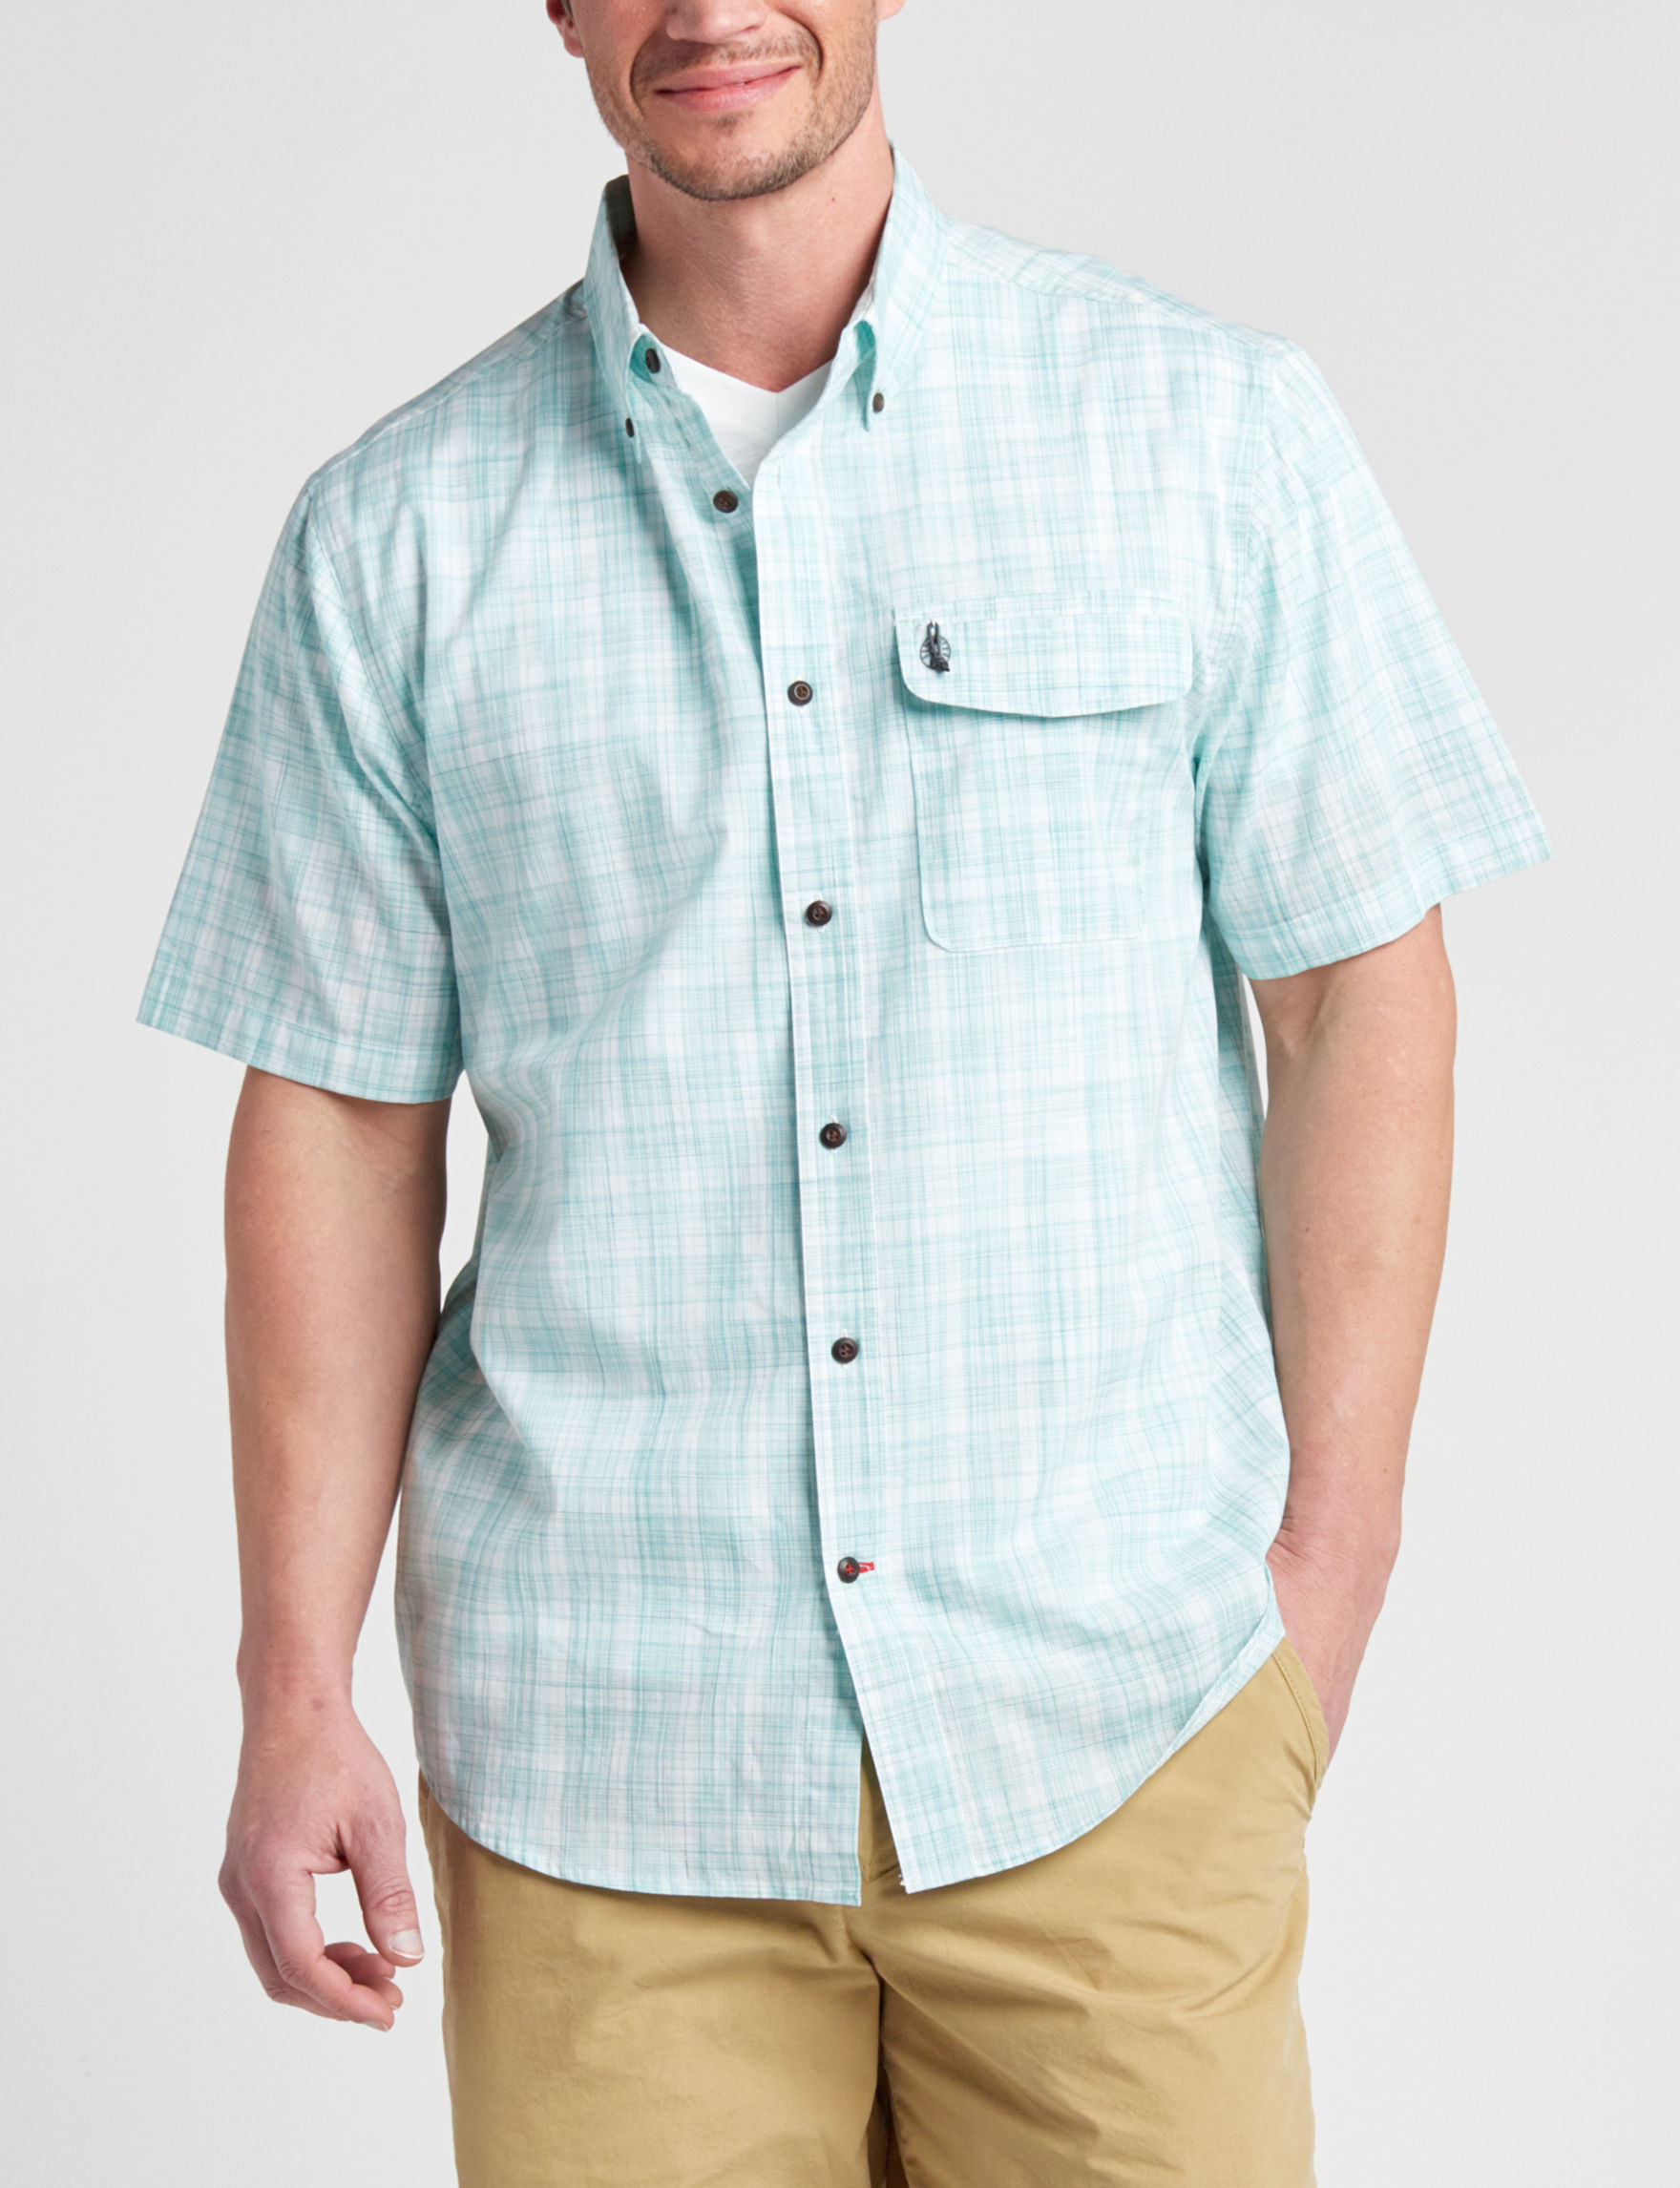 Coleman Aqua Casual Button Down Shirts